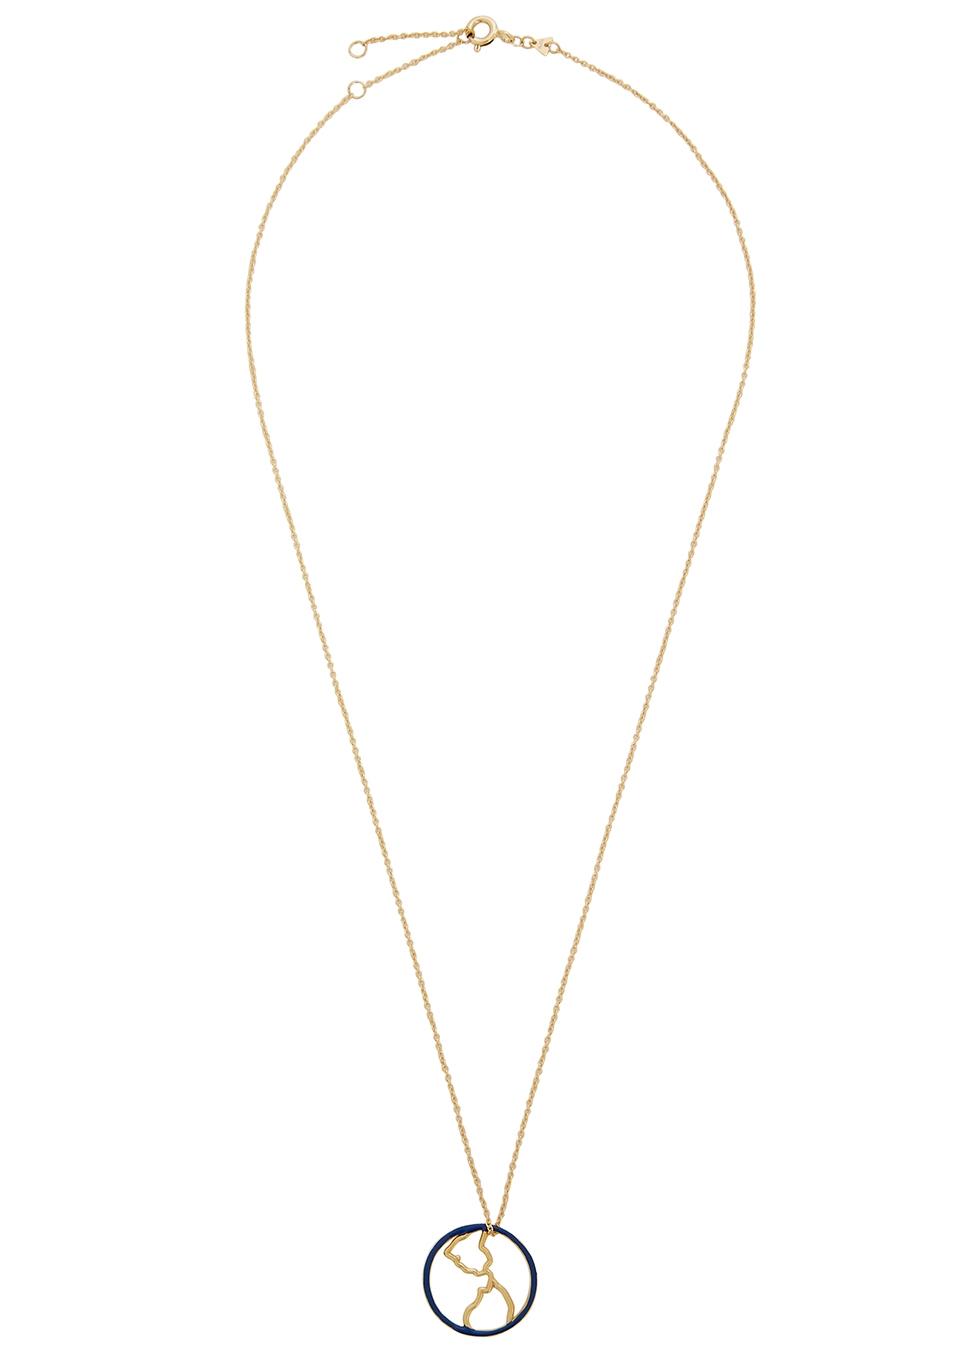 Mundo 9kt gold necklace